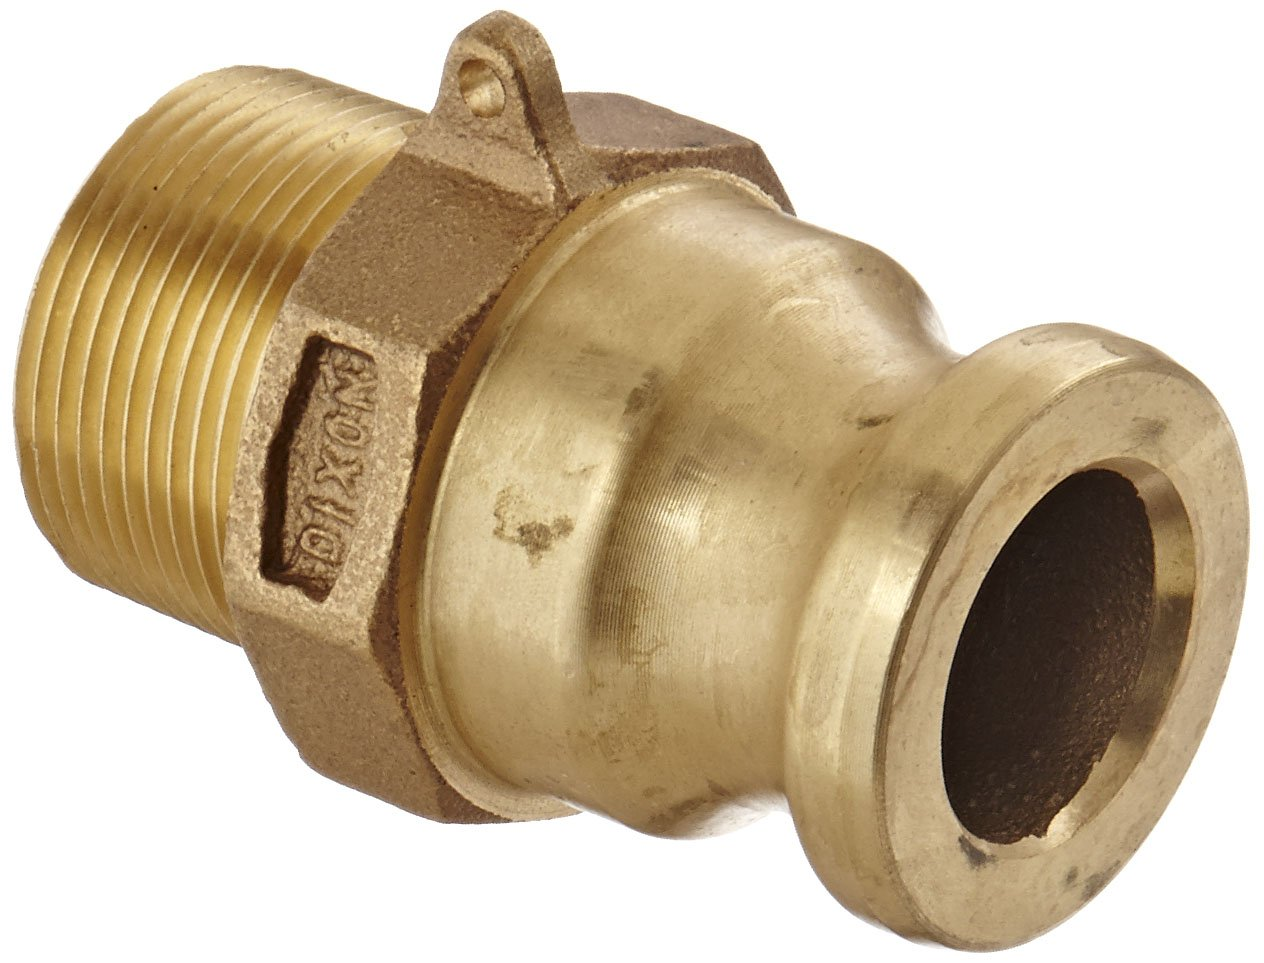 Dixon 125-F-BR Popular Max 58% OFF Brass Boss-Lock Type F and Cam Fittin Groove Hose